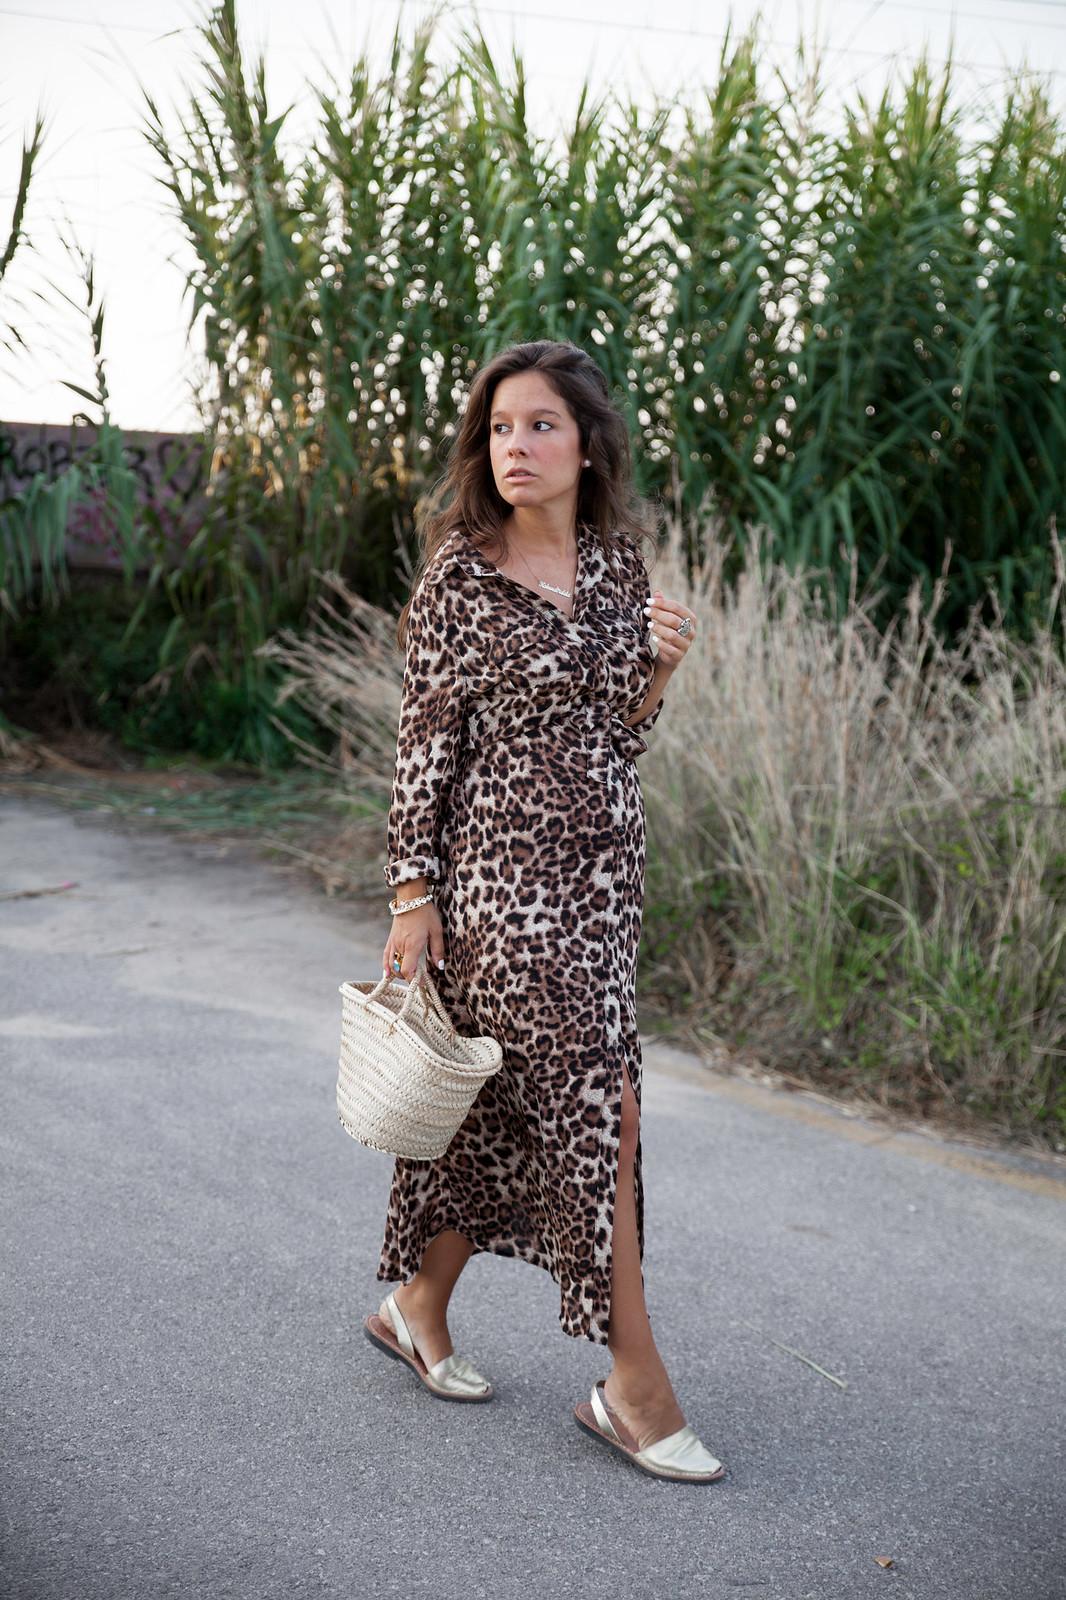 05_leopardo_estampado_tendencia_otoño_18_19_theguestgirl_leopard_dress_loavies_pregnant_barcelona_embarazada_influencer_outfit_otoño